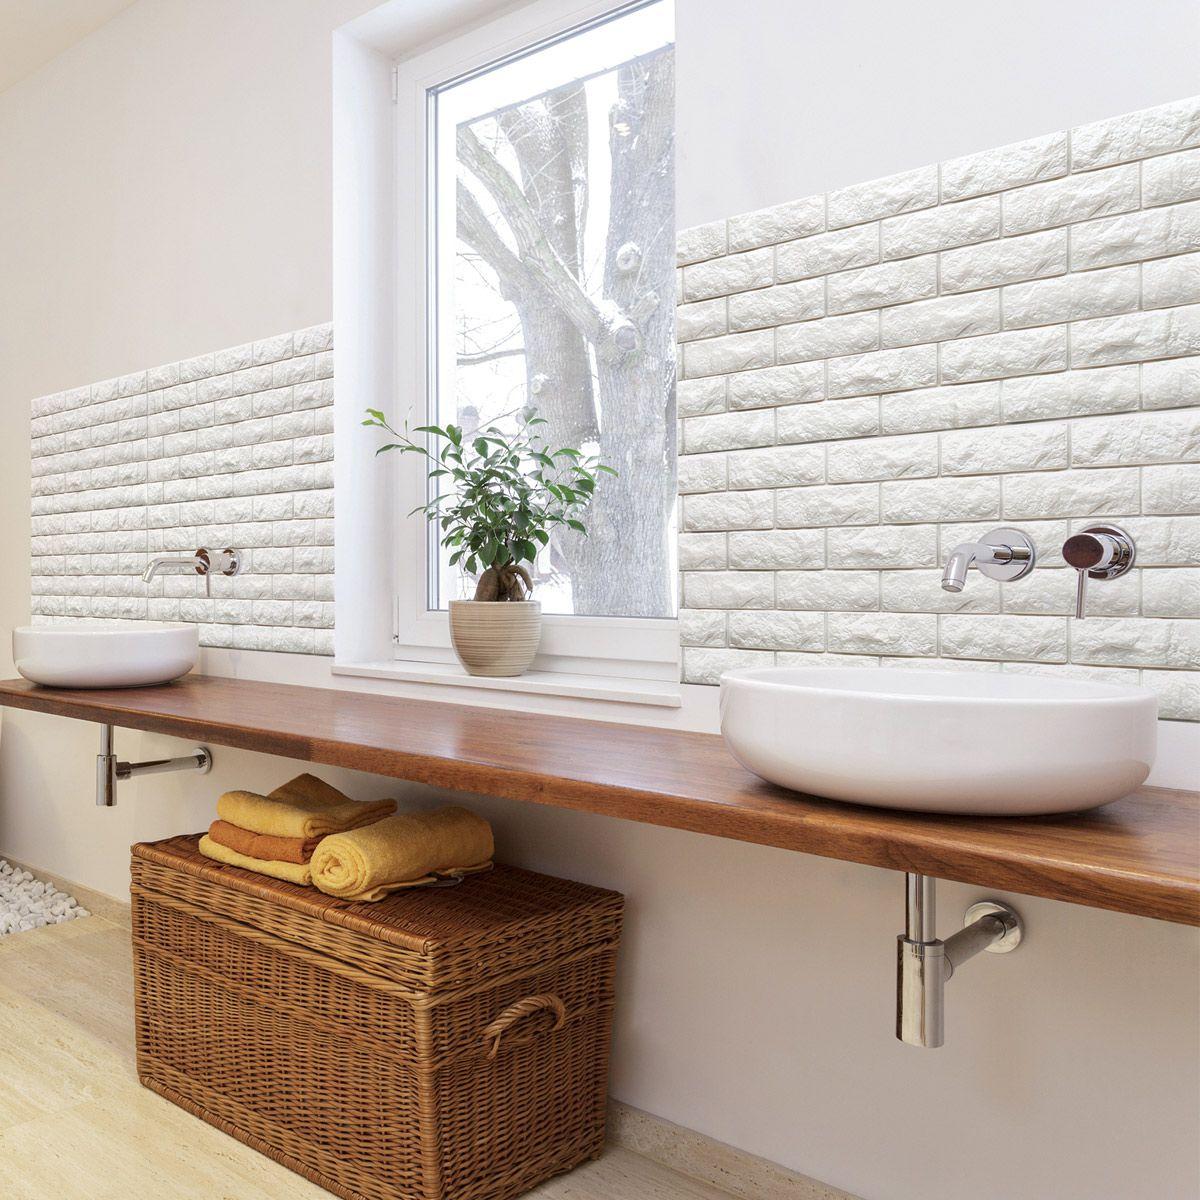 A06501 Peel & Stick 3D Wall Panels Foam Block Brick Design ...